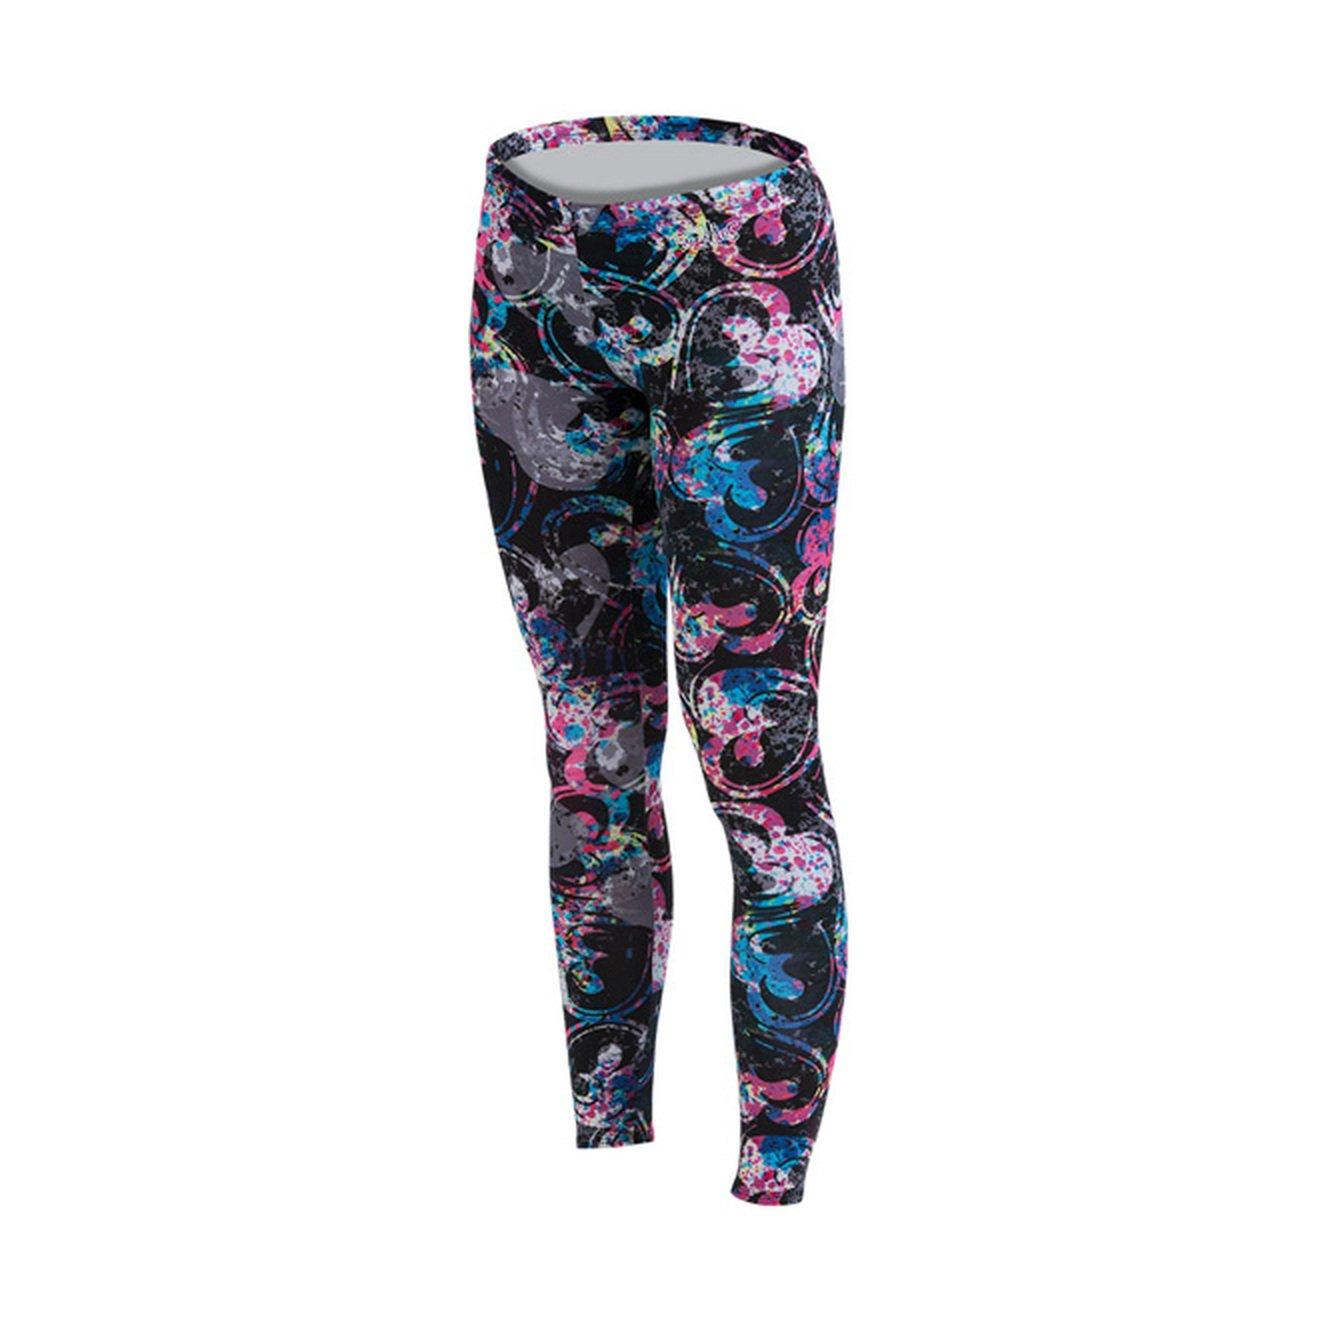 d035fd8e3eda2 Dolfin Uglies Drag Tights: Amazon.co.uk: Clothing